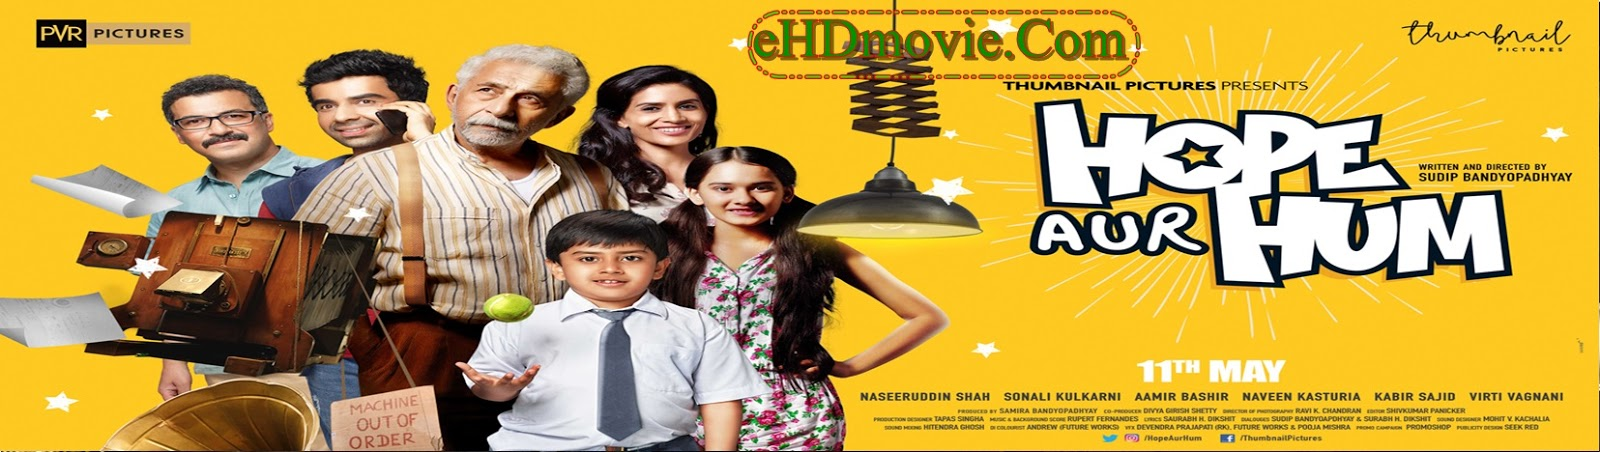 Hope Aur Hum 2018 Full Movie Hindi 720p - HEVC - 480p ORG HDRip 400MB - 300MB - 750MB ESubs Free Download